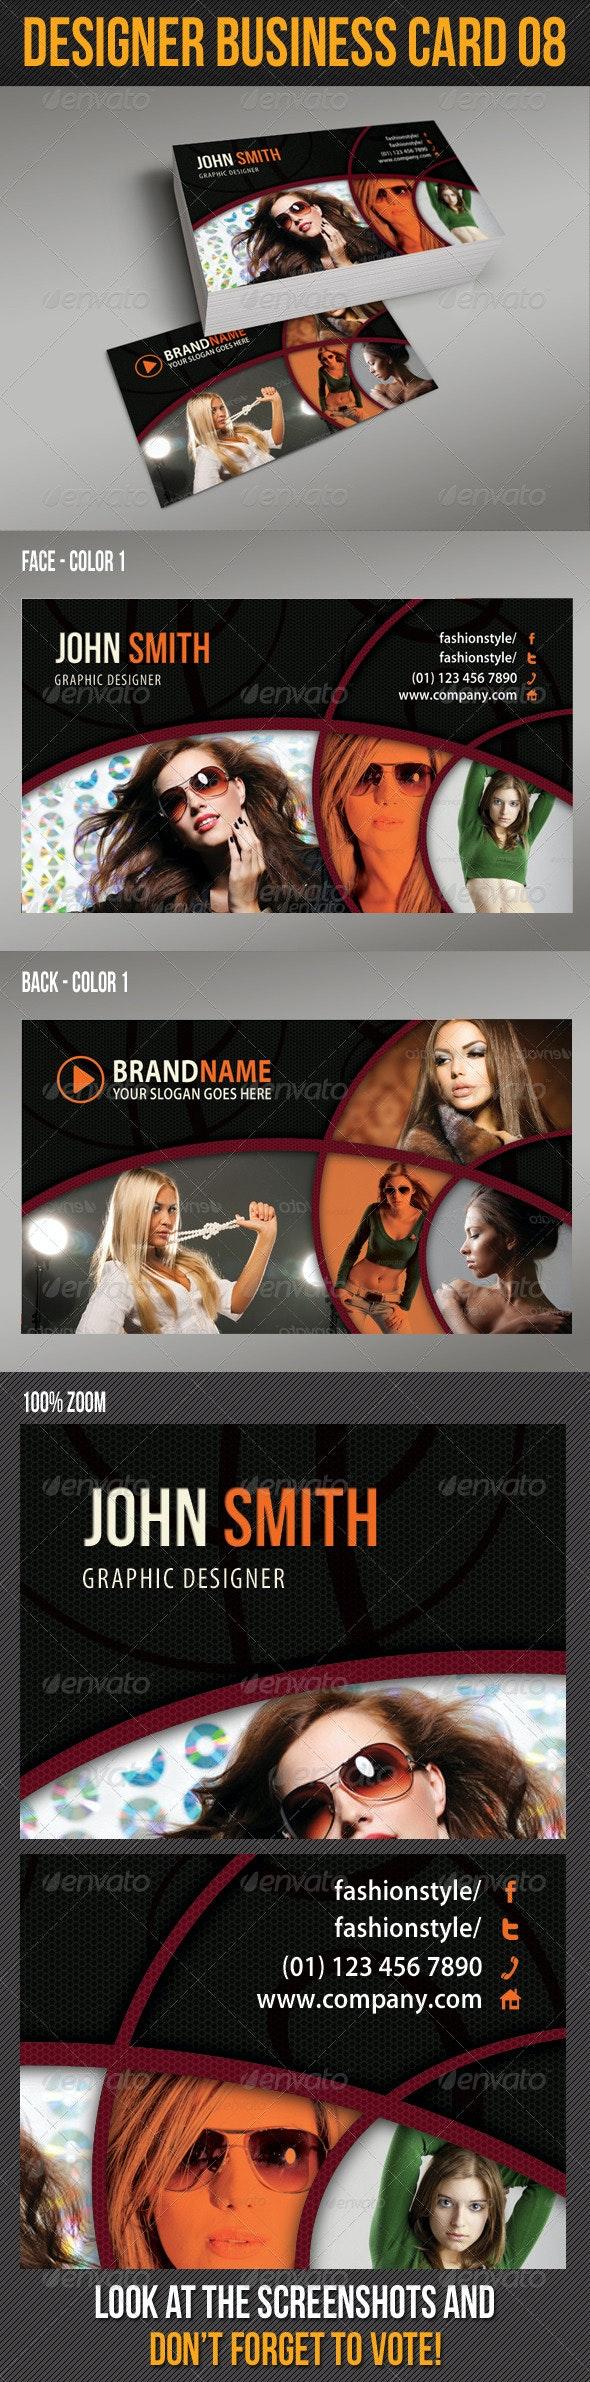 Designer Business Card 08 - Creative Business Cards